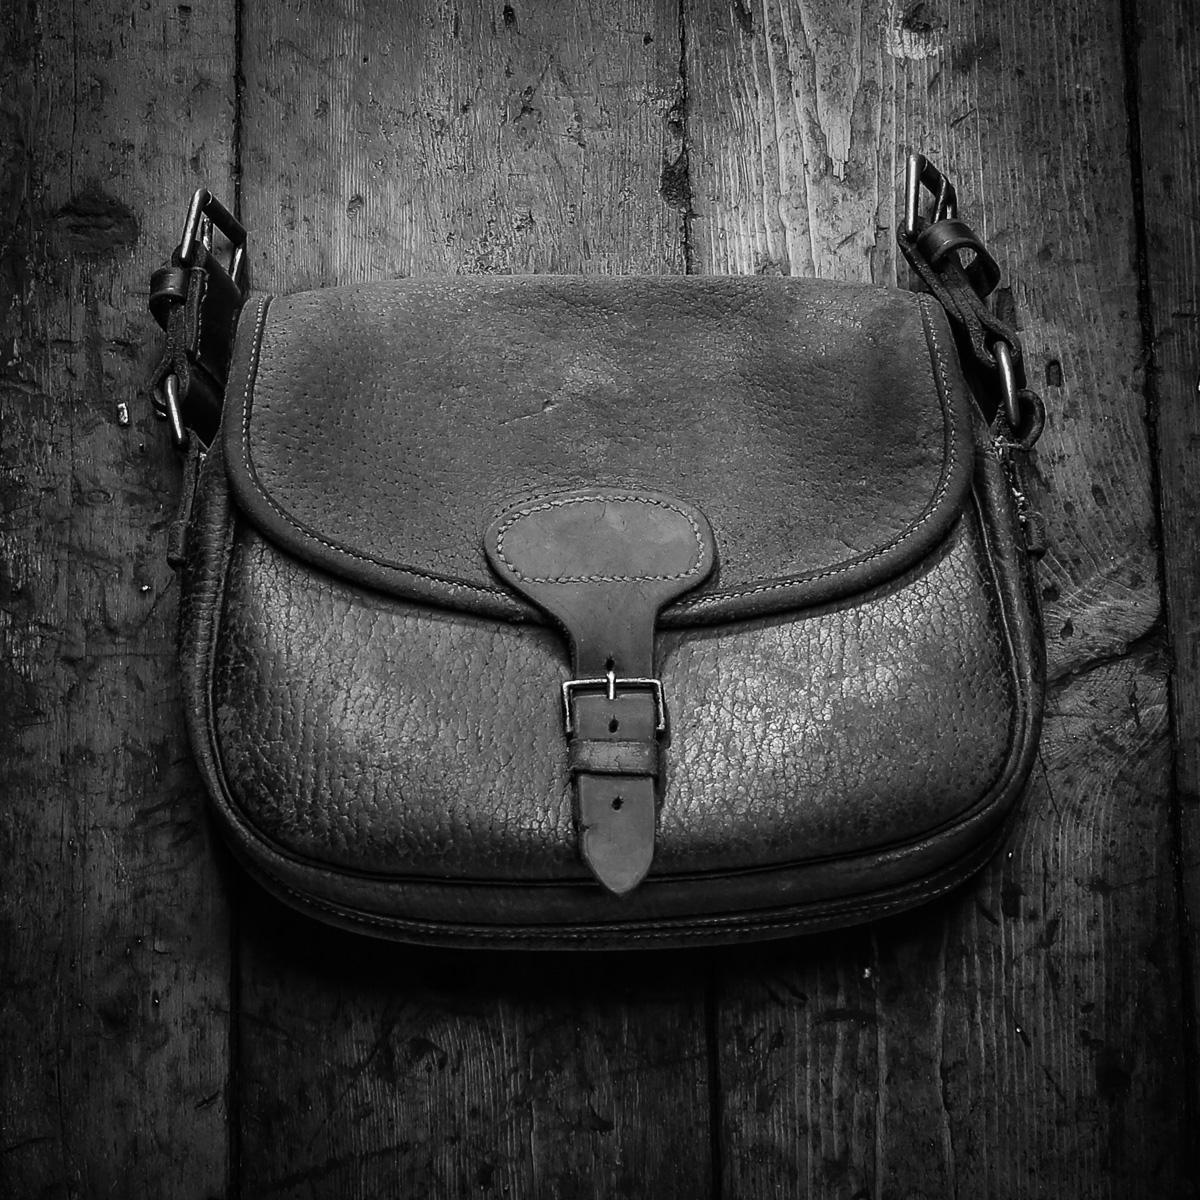 Perfecta Cartridge Bag, Westkey Richards